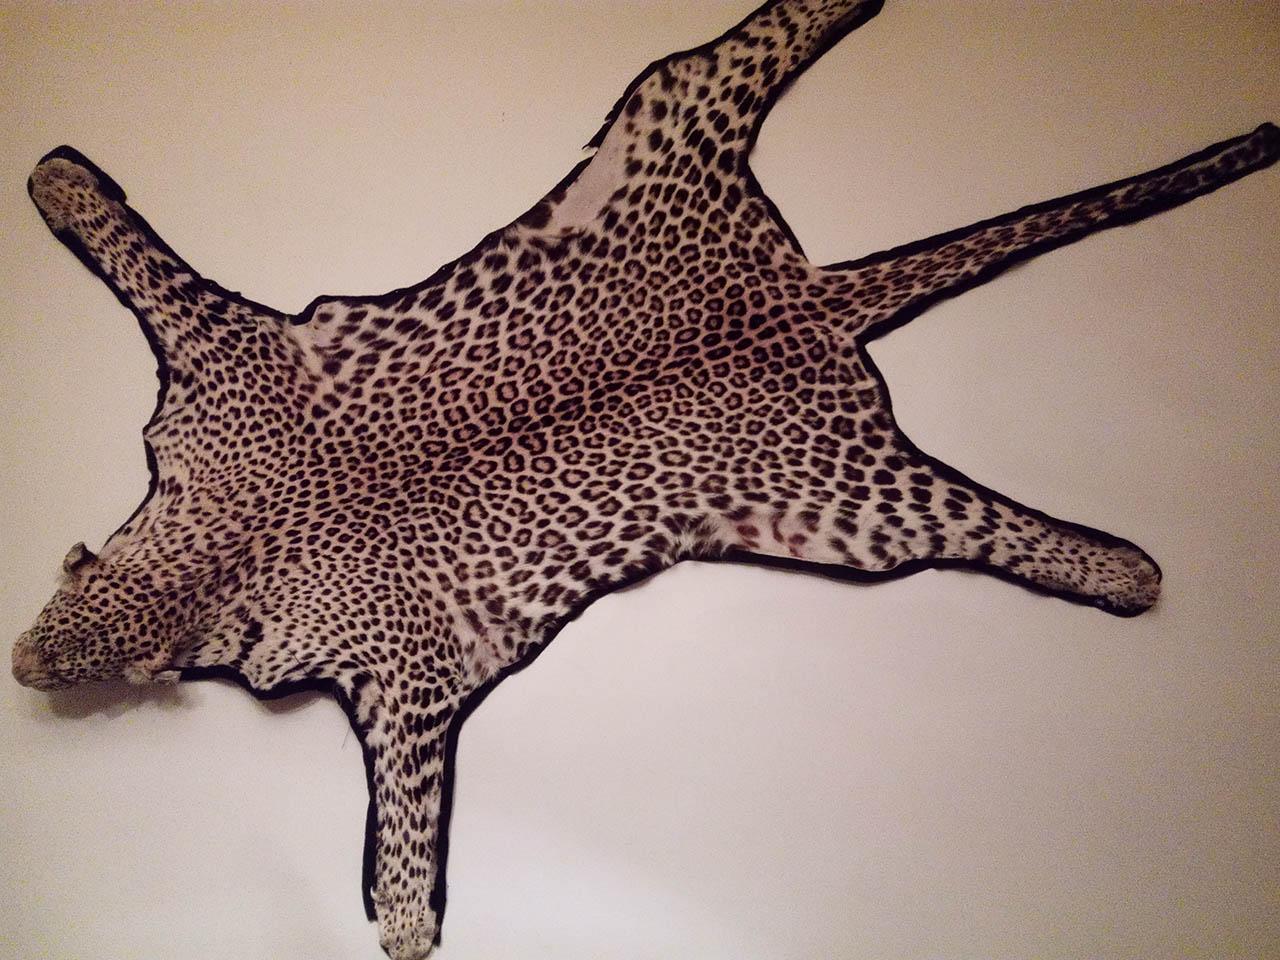 Hunter's Cove Room - leopard skin.